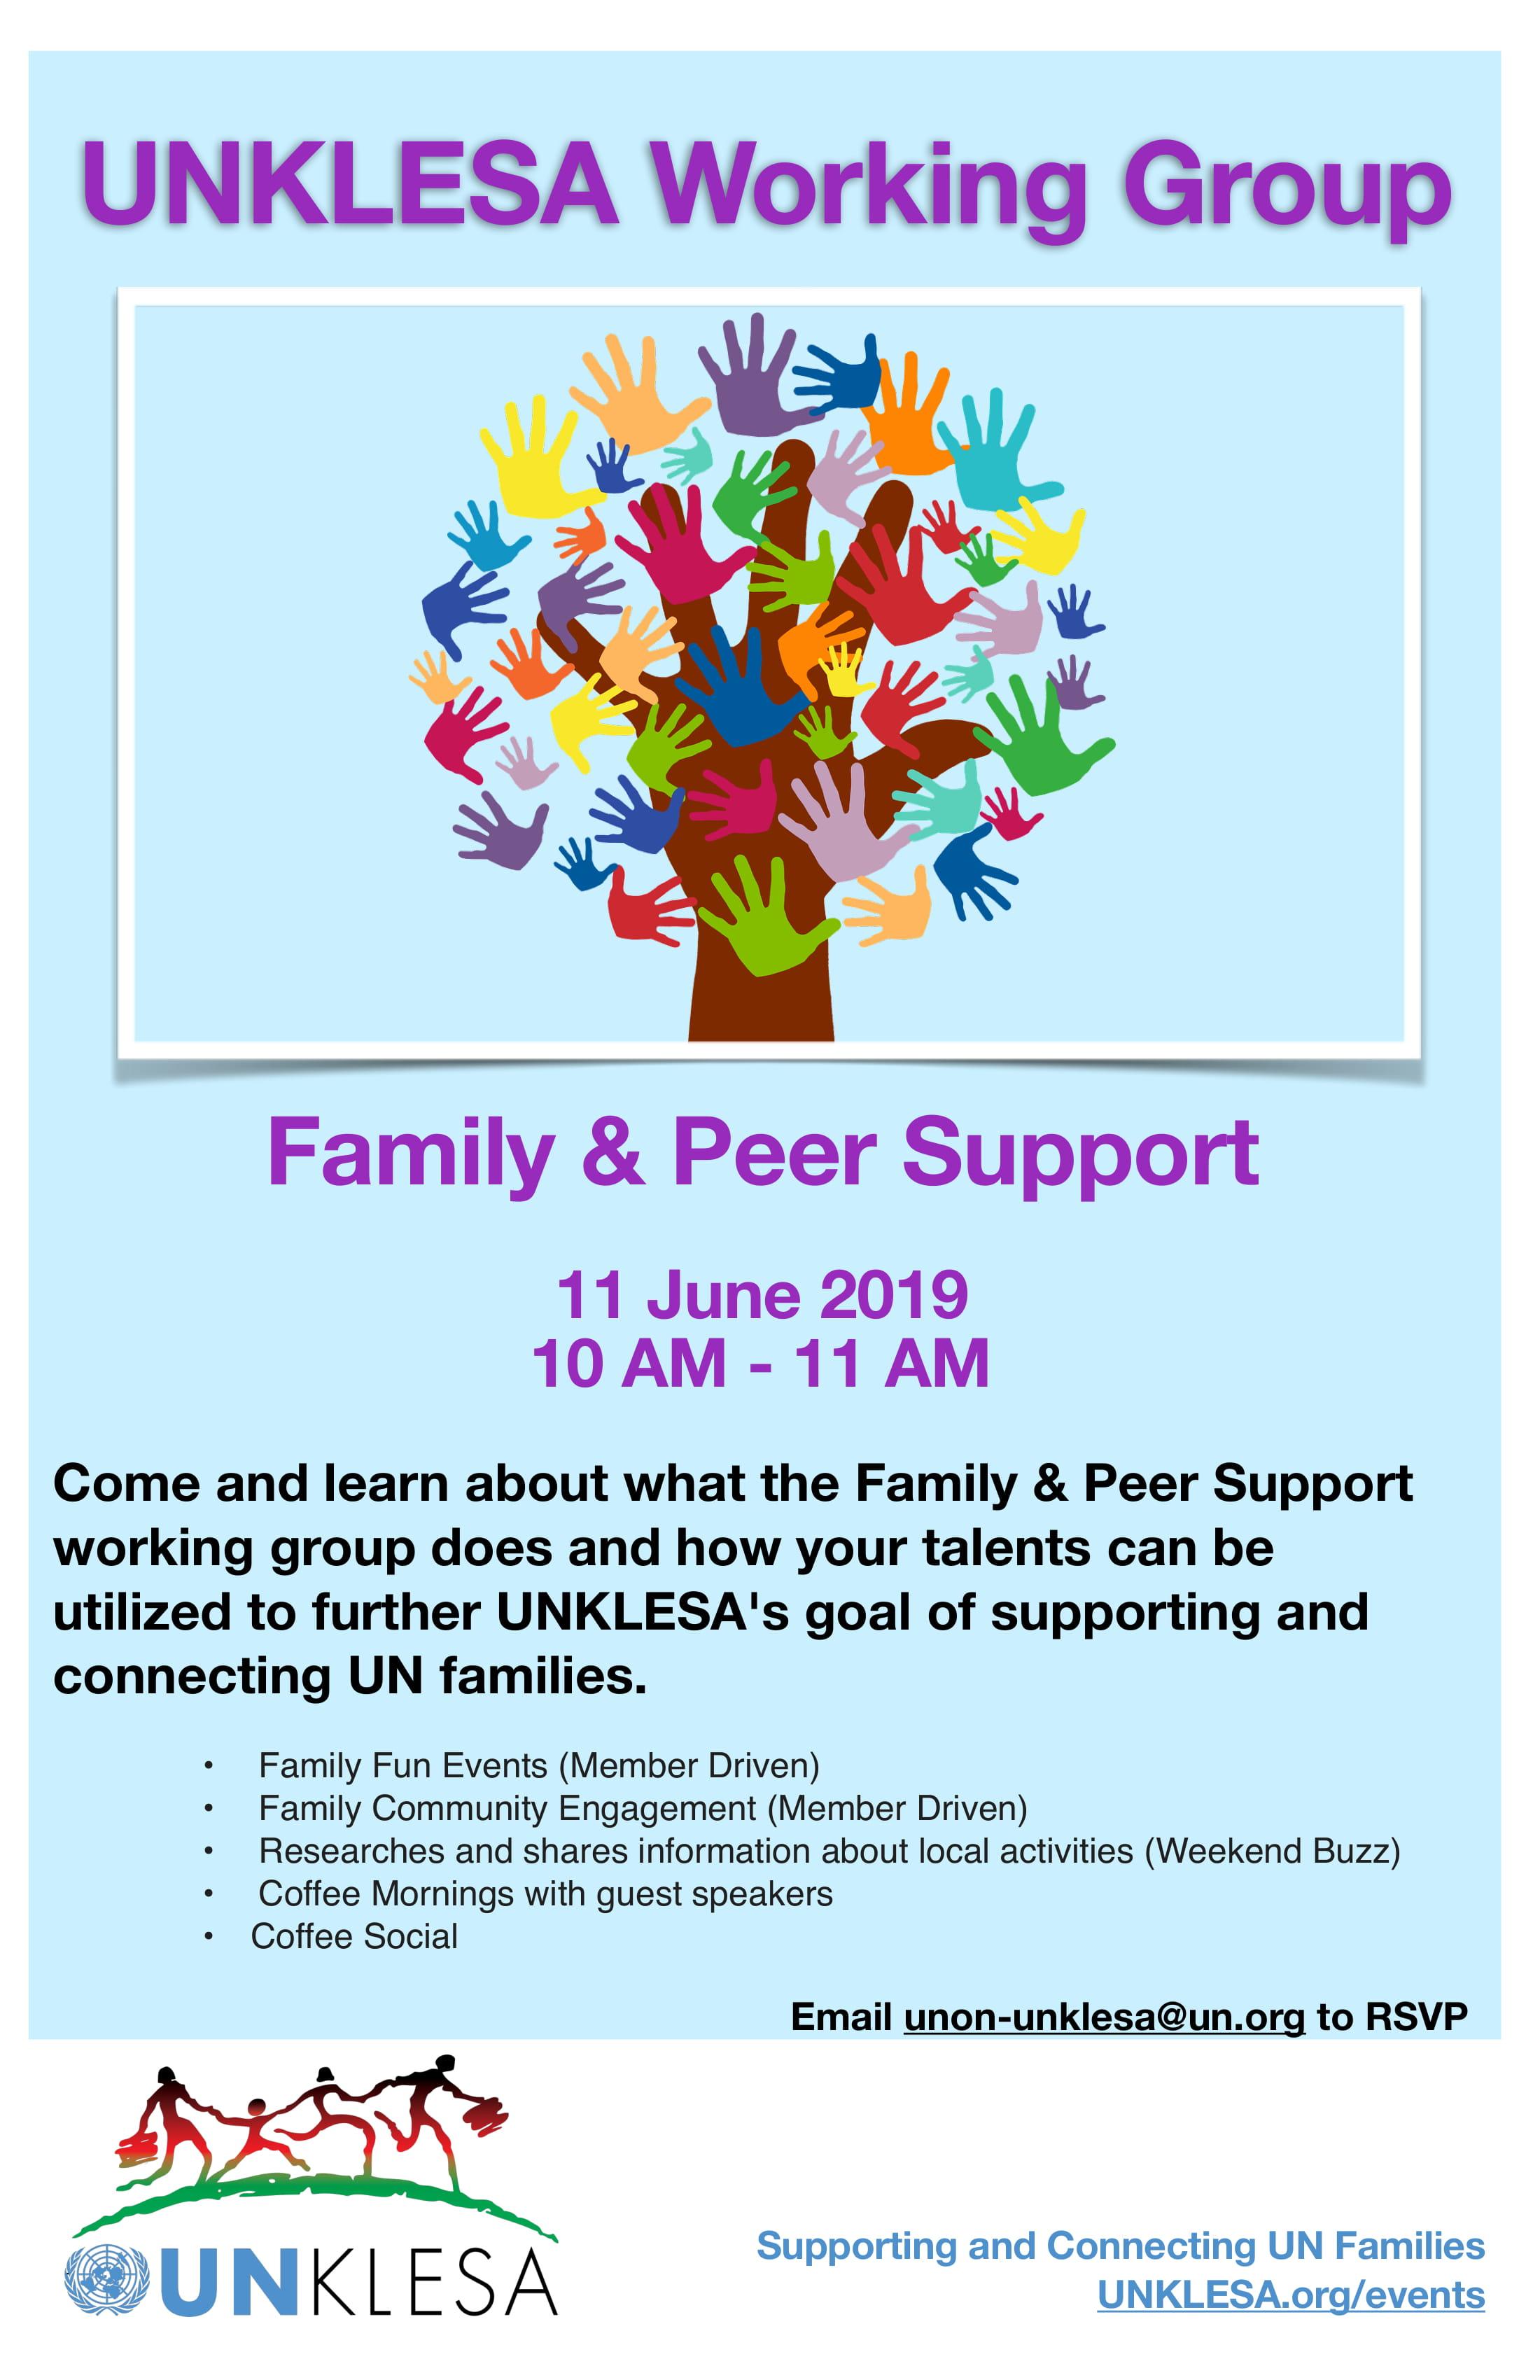 UNKLESA_Family&PeerSupport_June11-1.jpg